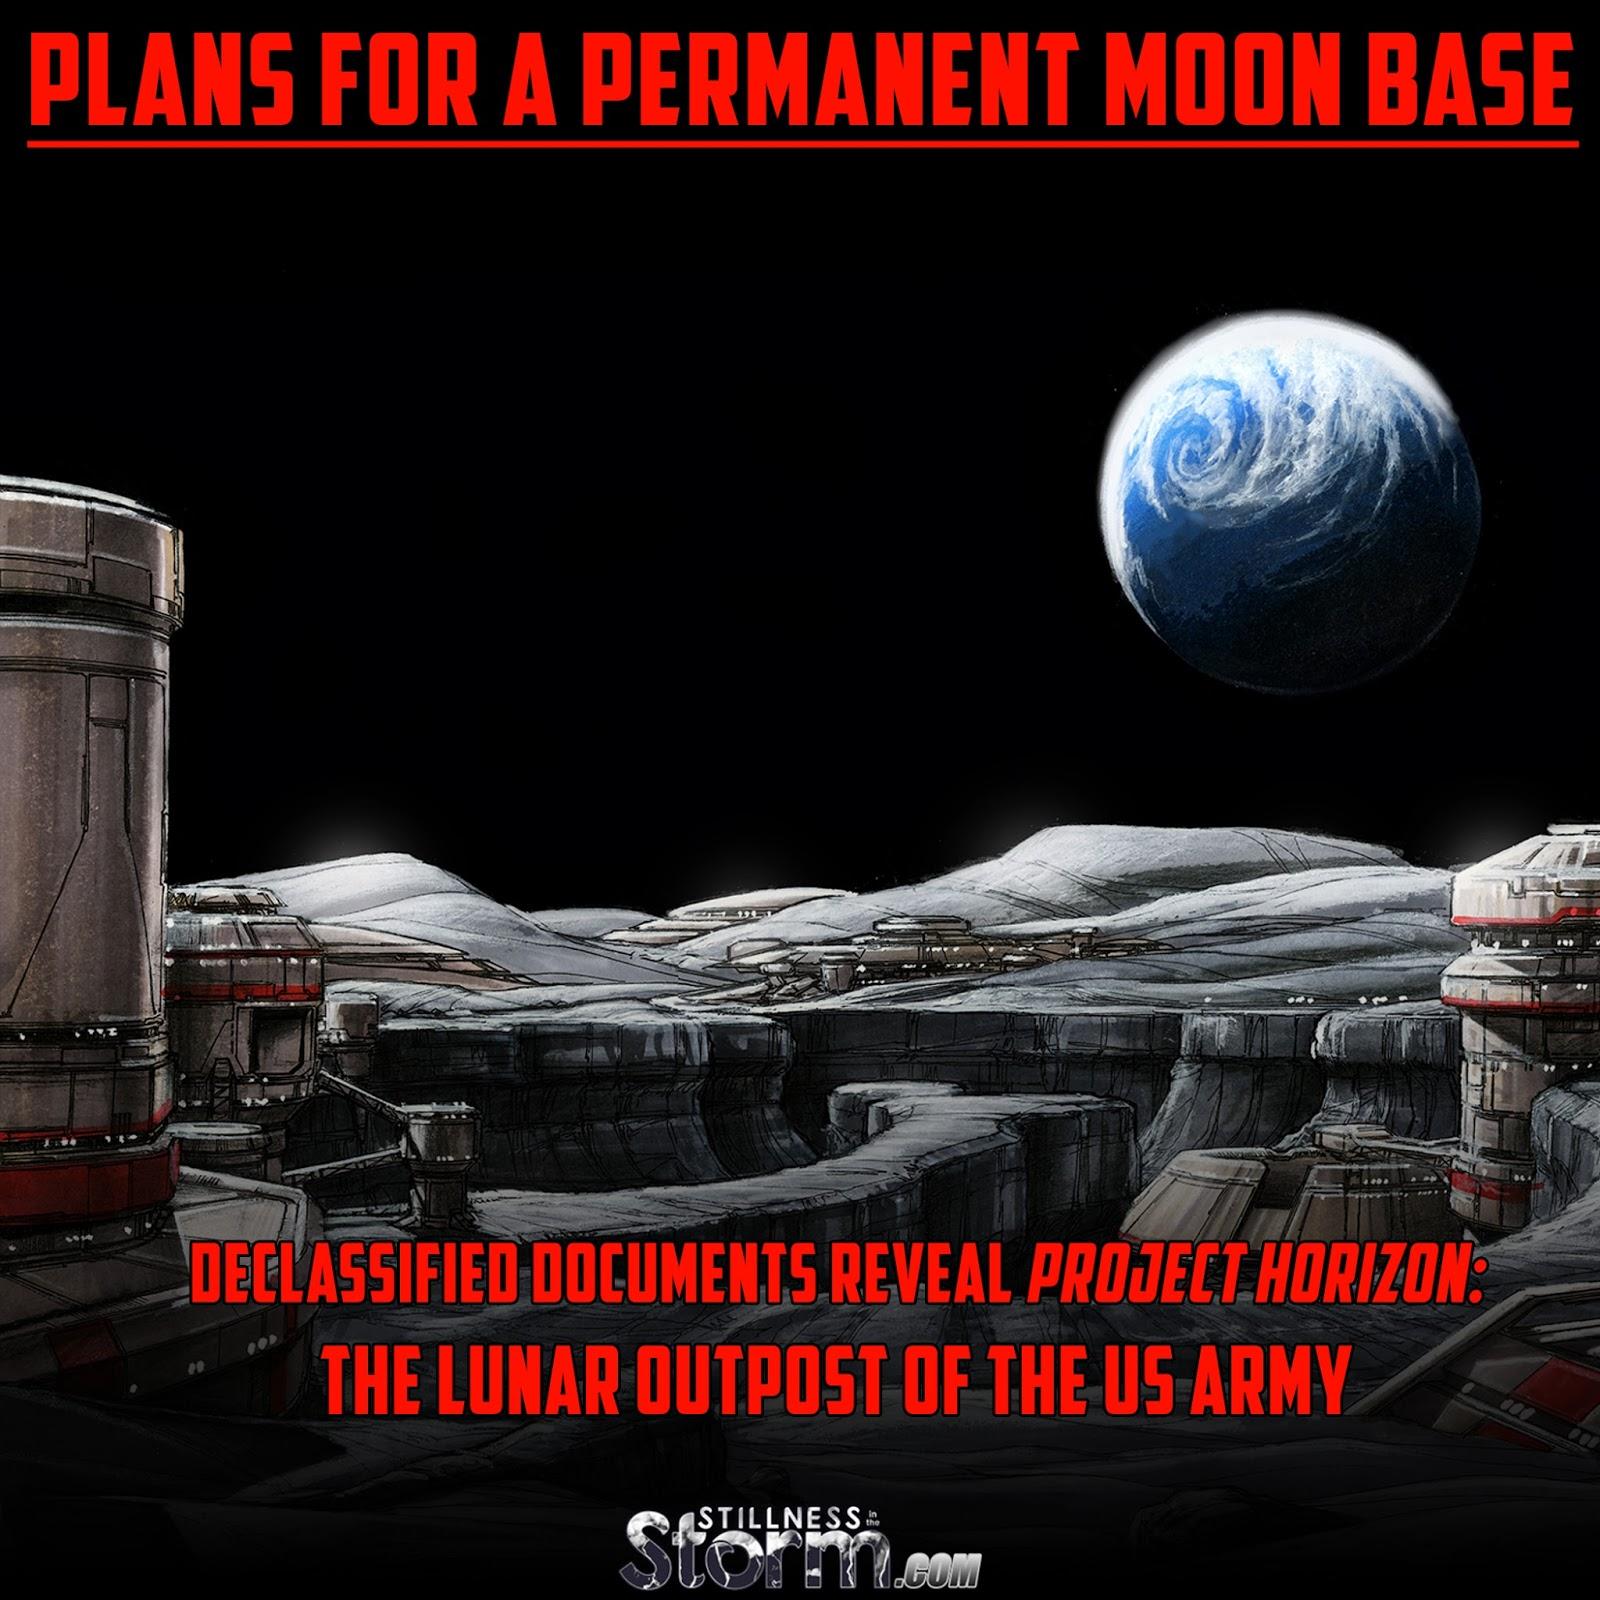 project horizon moon base documents - photo #1